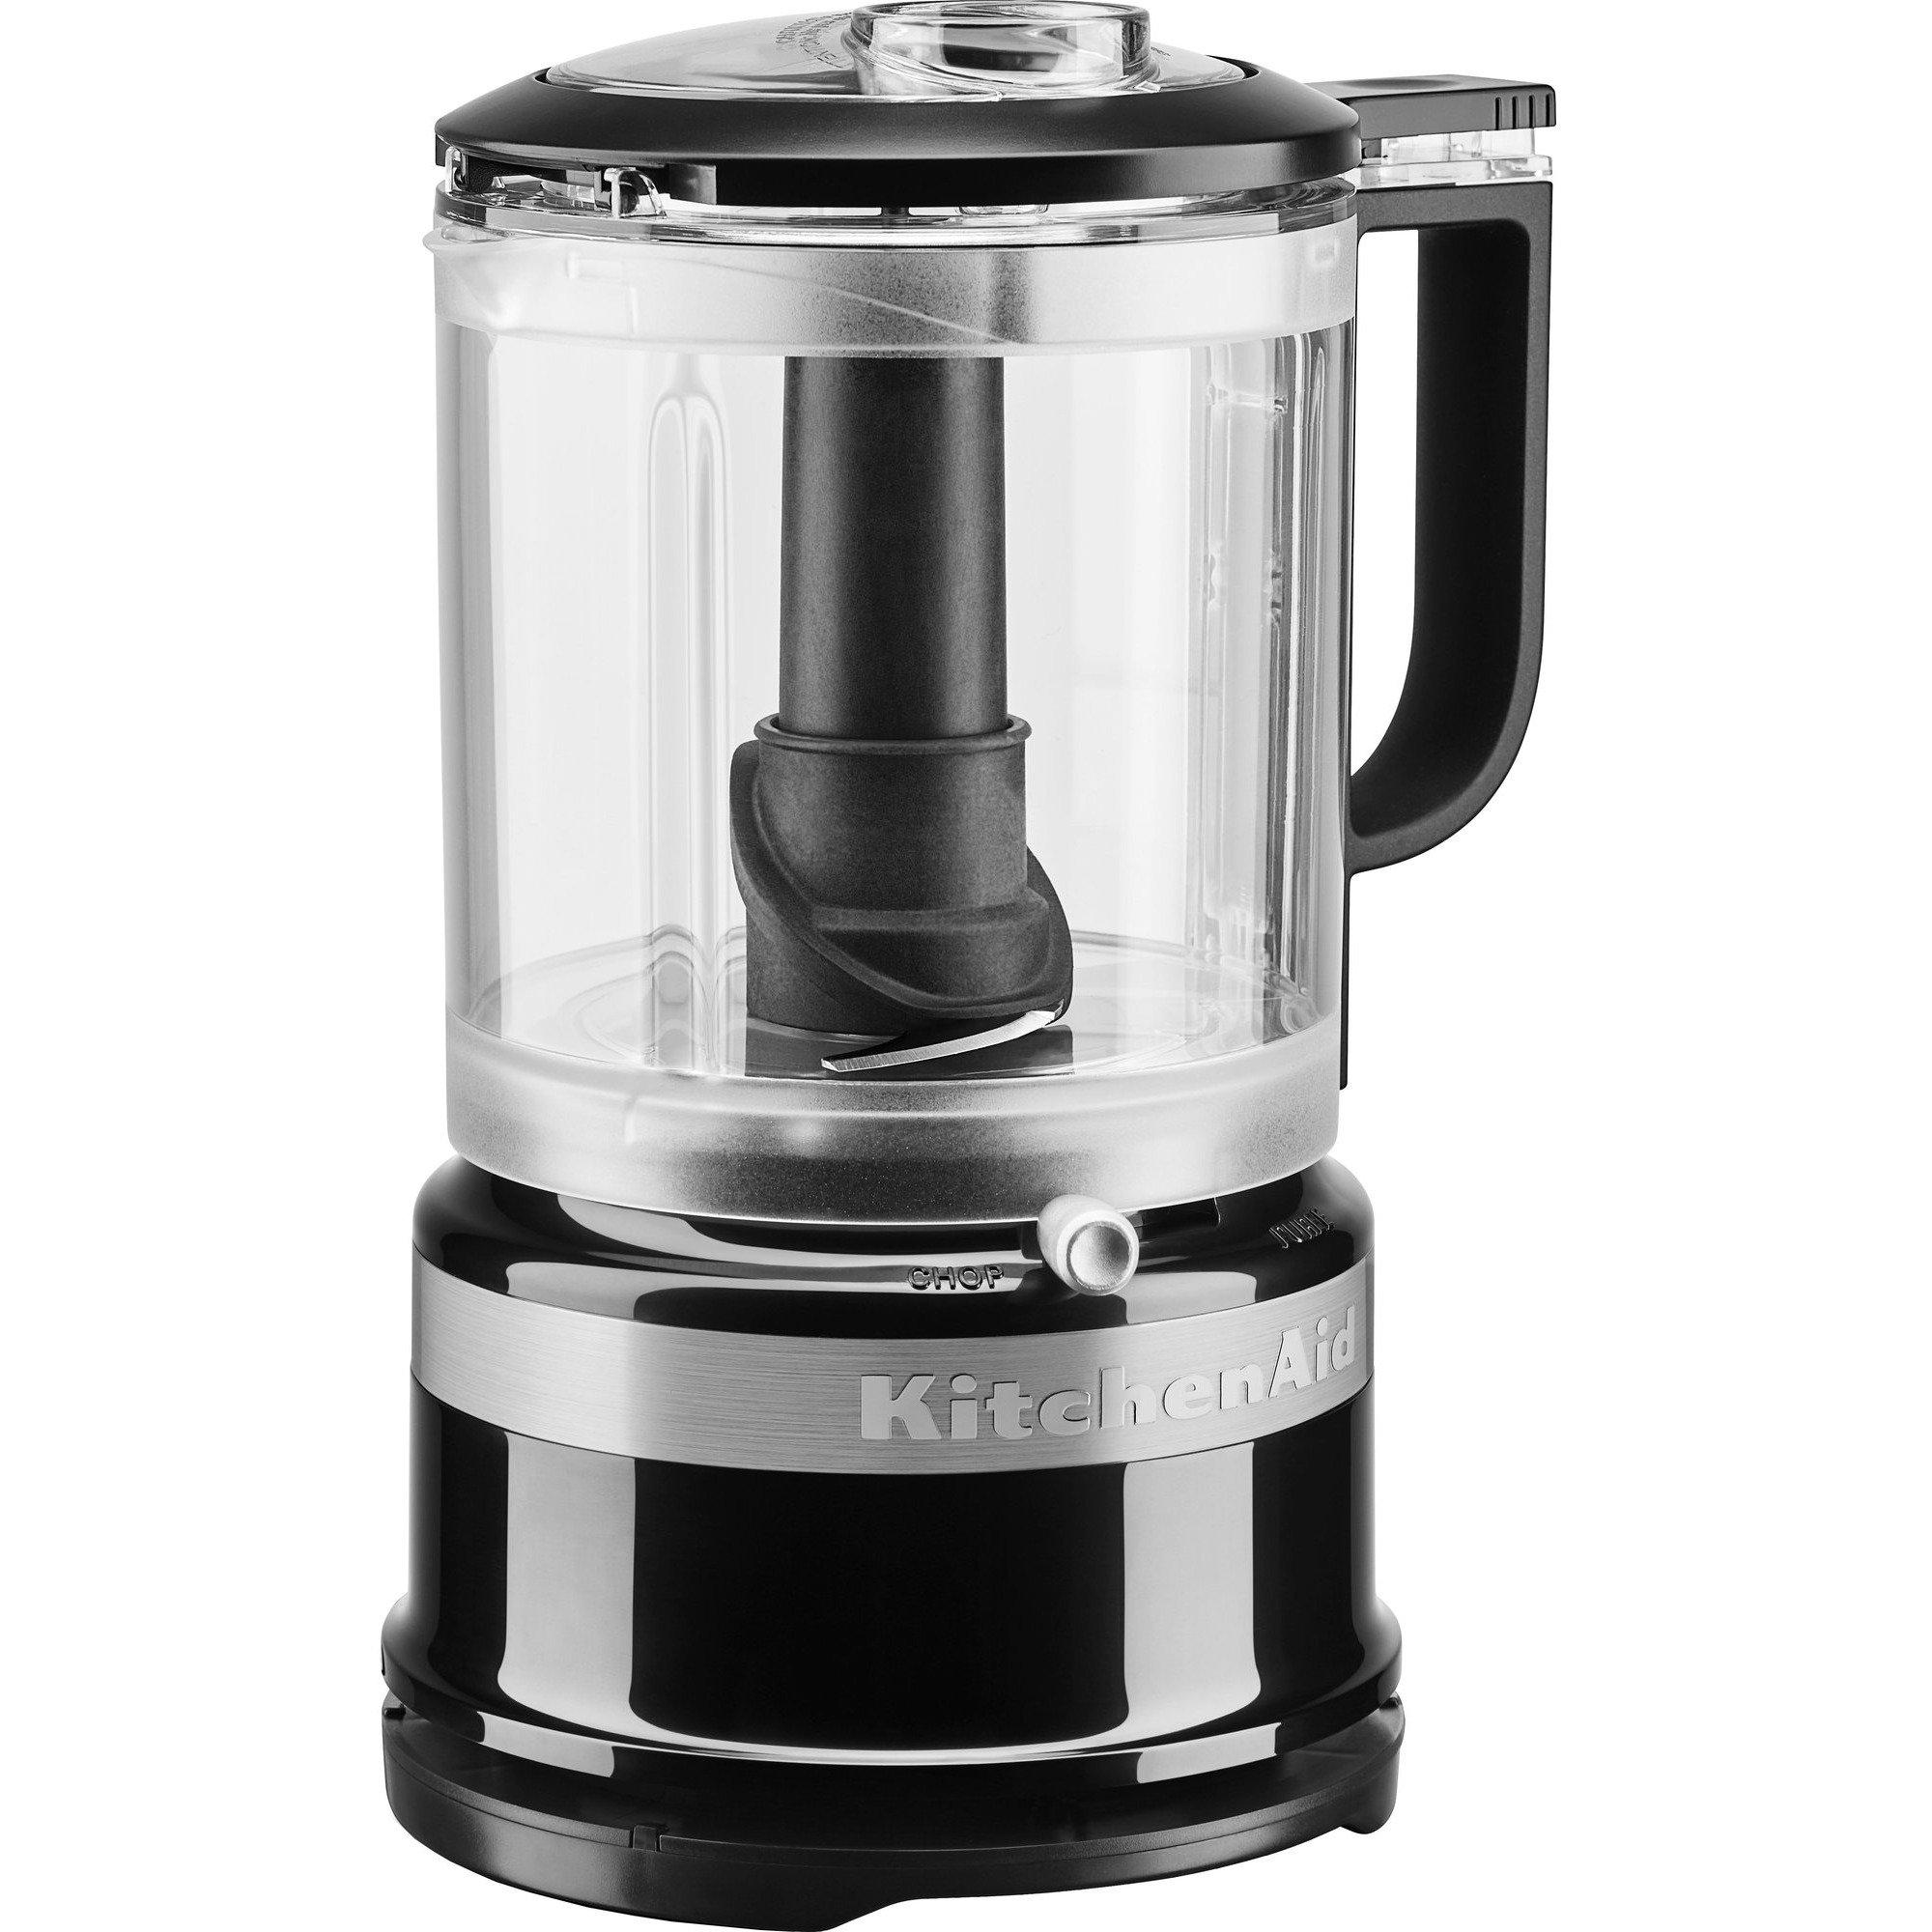 KitchenAid 5KFC0516 119 Liter Mini matberedare Svart